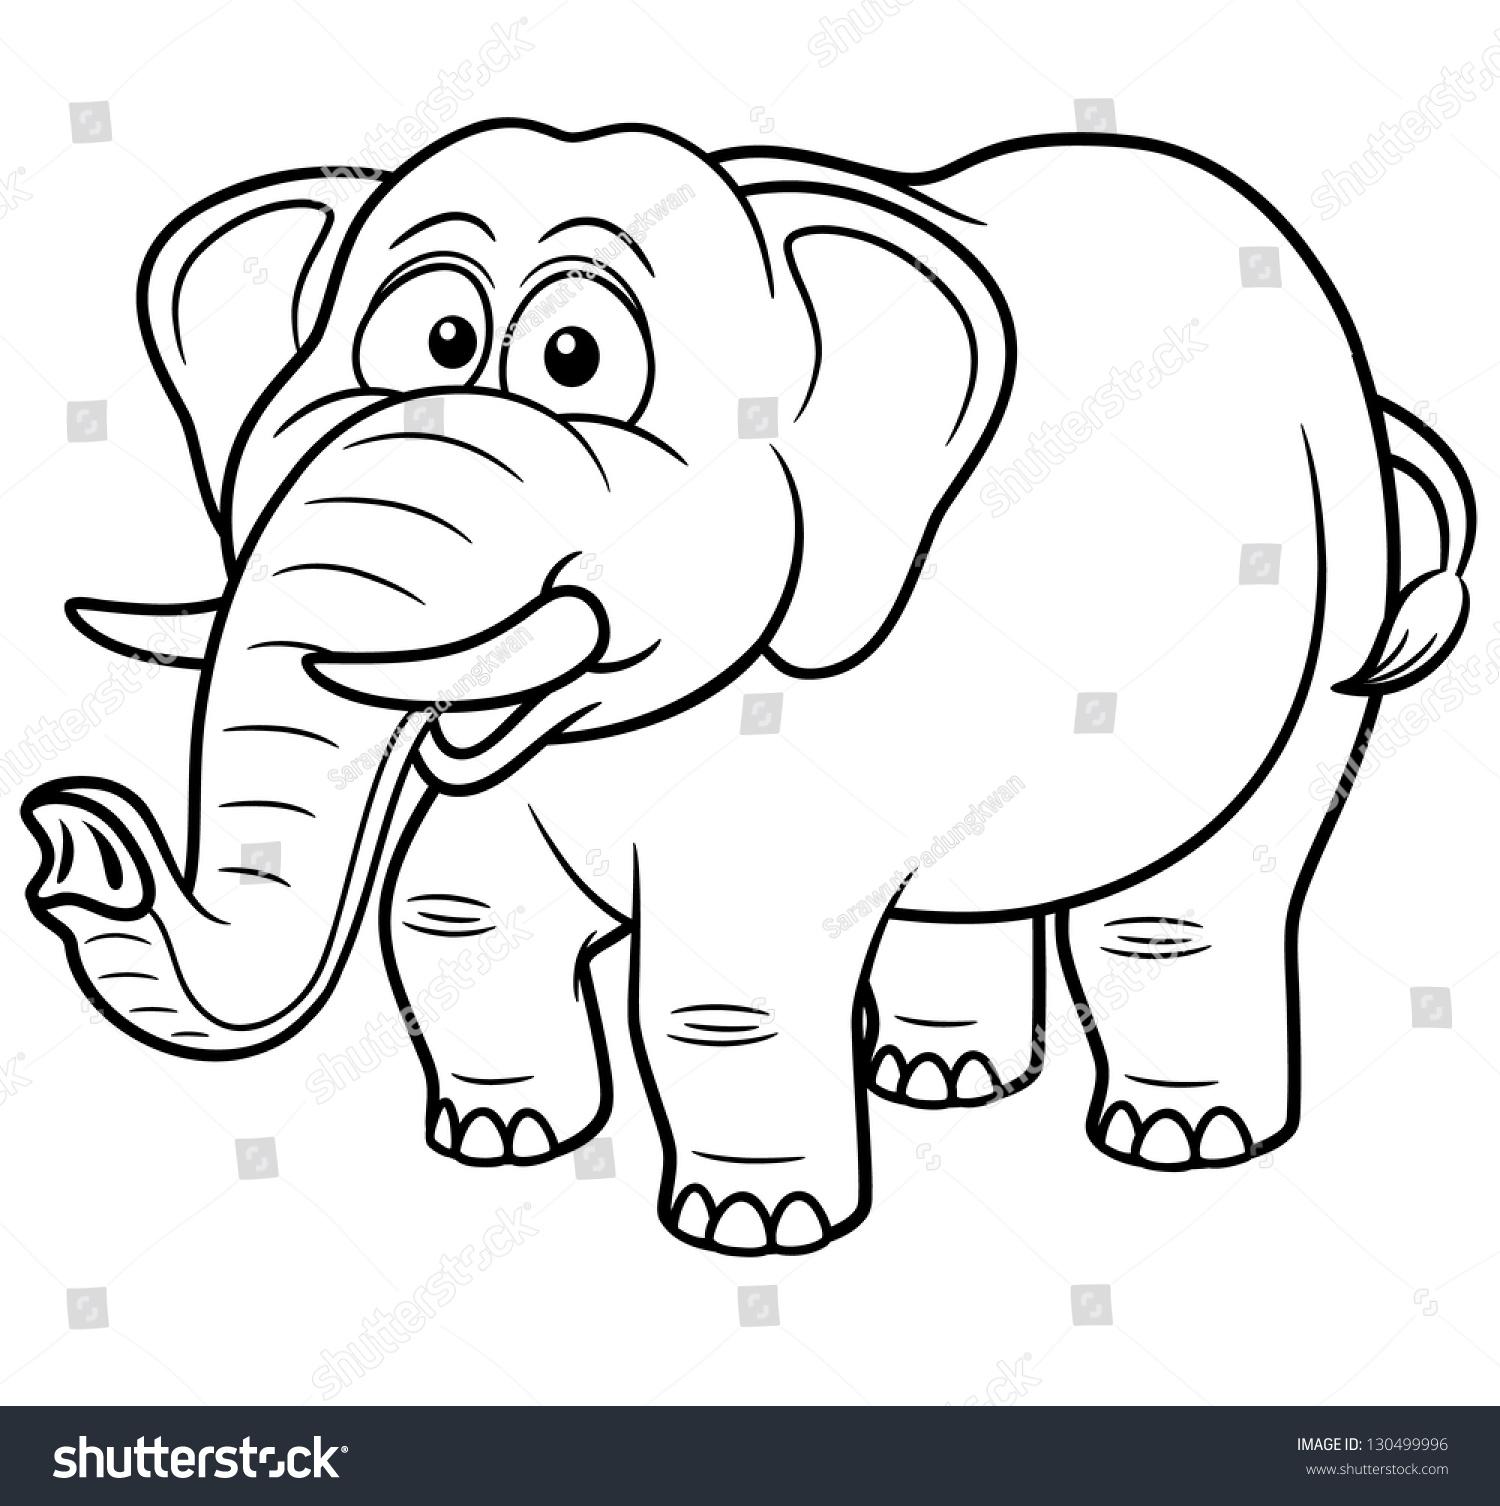 Vector illustration cartoon elephant coloring book stock for Cartoon elephant coloring pages